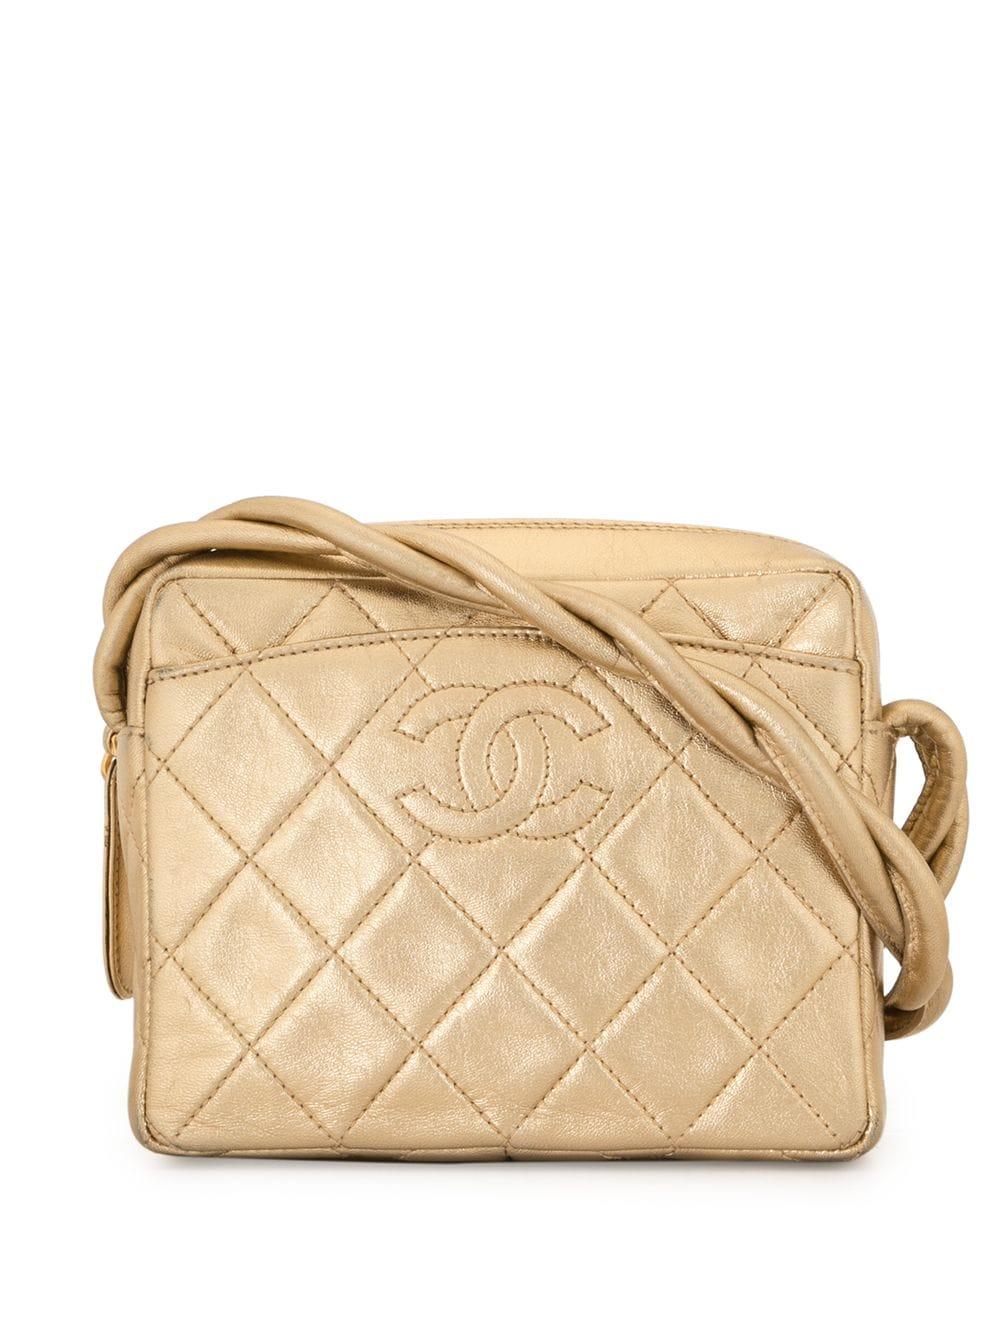 Chanel Pre-Owned 1997 Umhängetasche mit Steppung - Gold